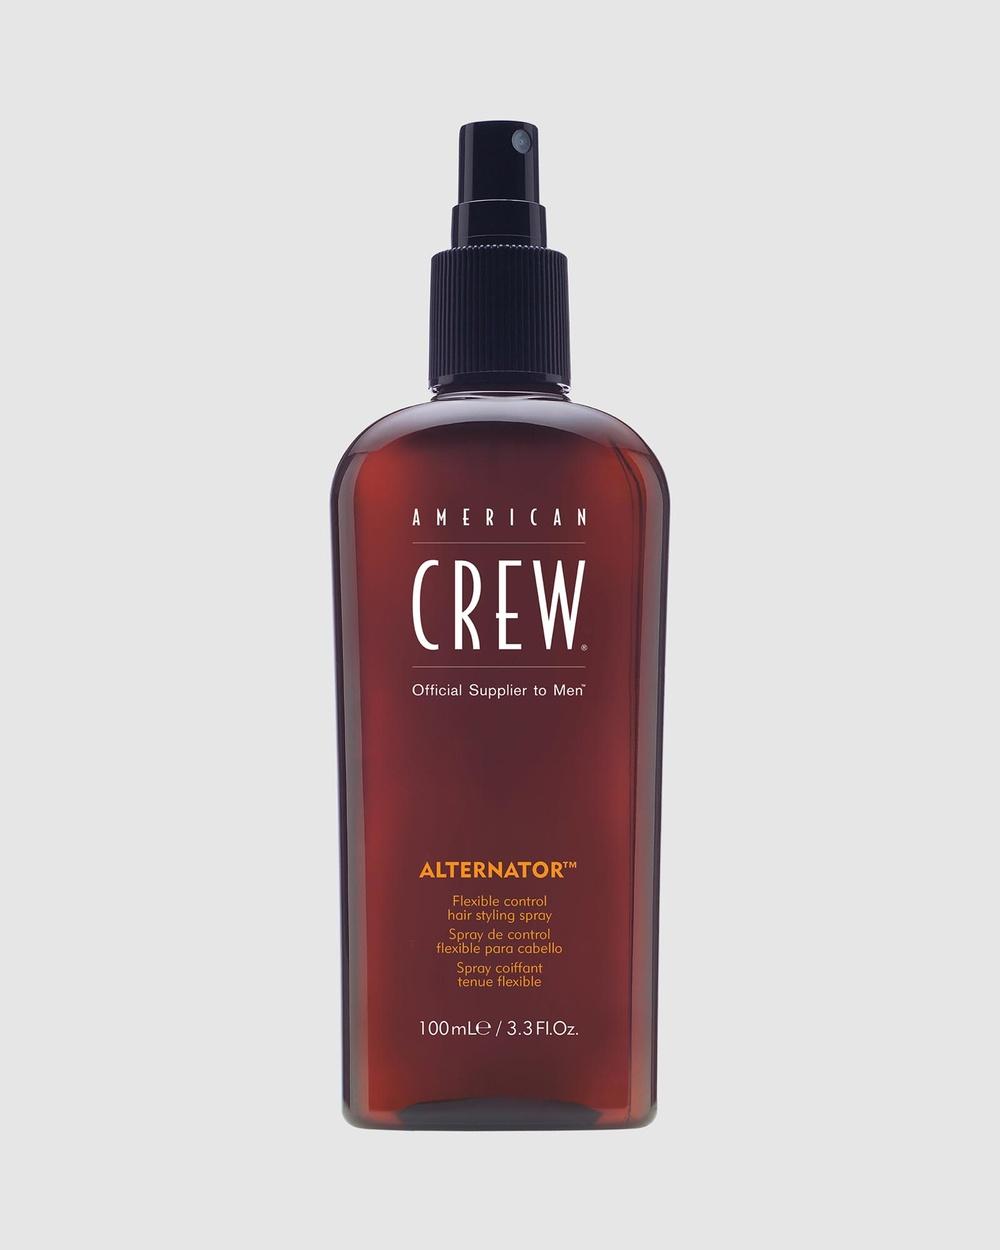 American Crew Alternator Finishing Spray Beauty Brown